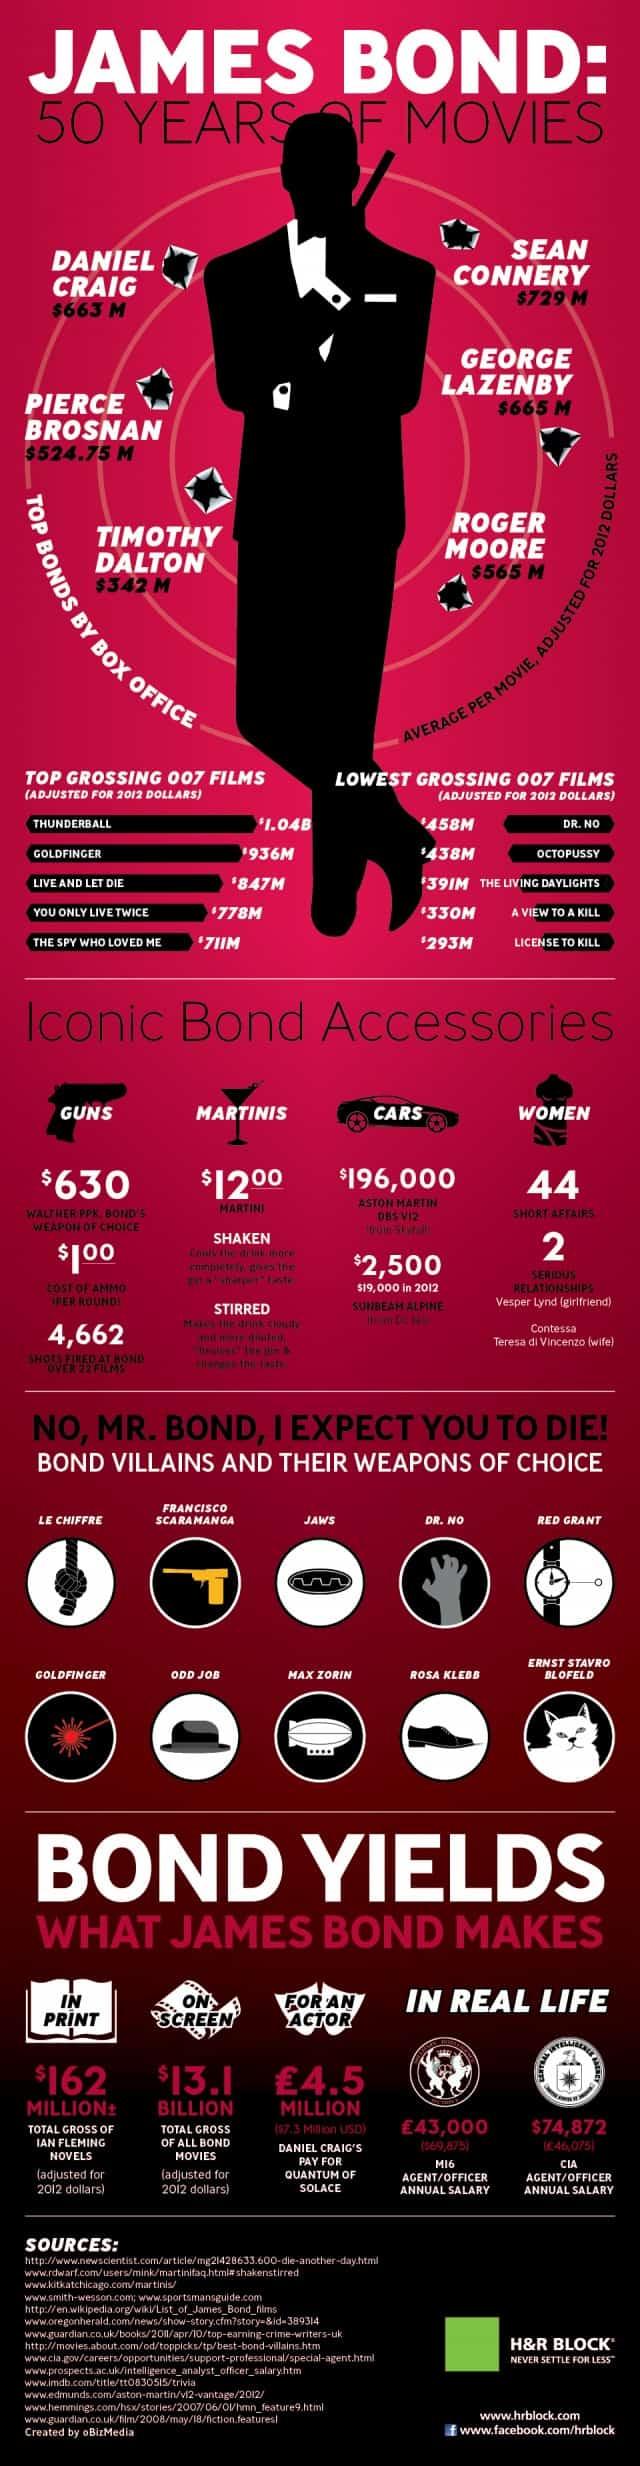 50 Years of Movies James Bond